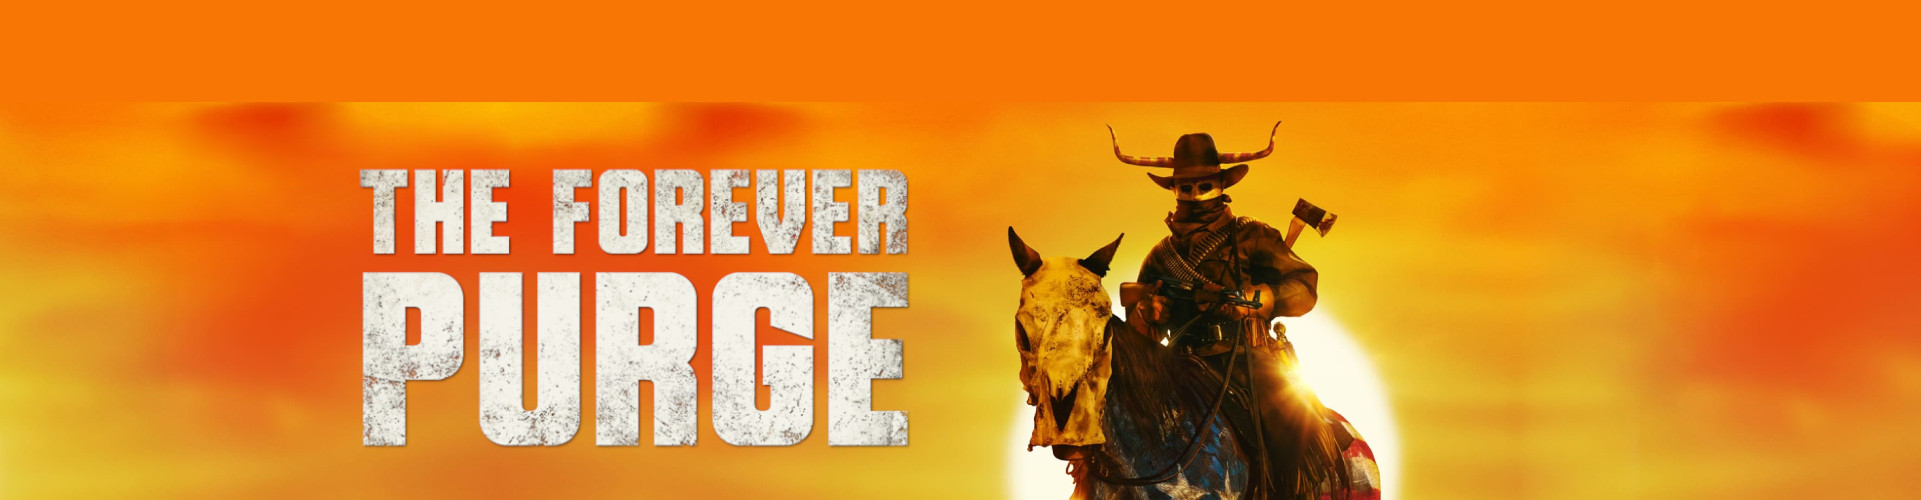 FORVER PURGE